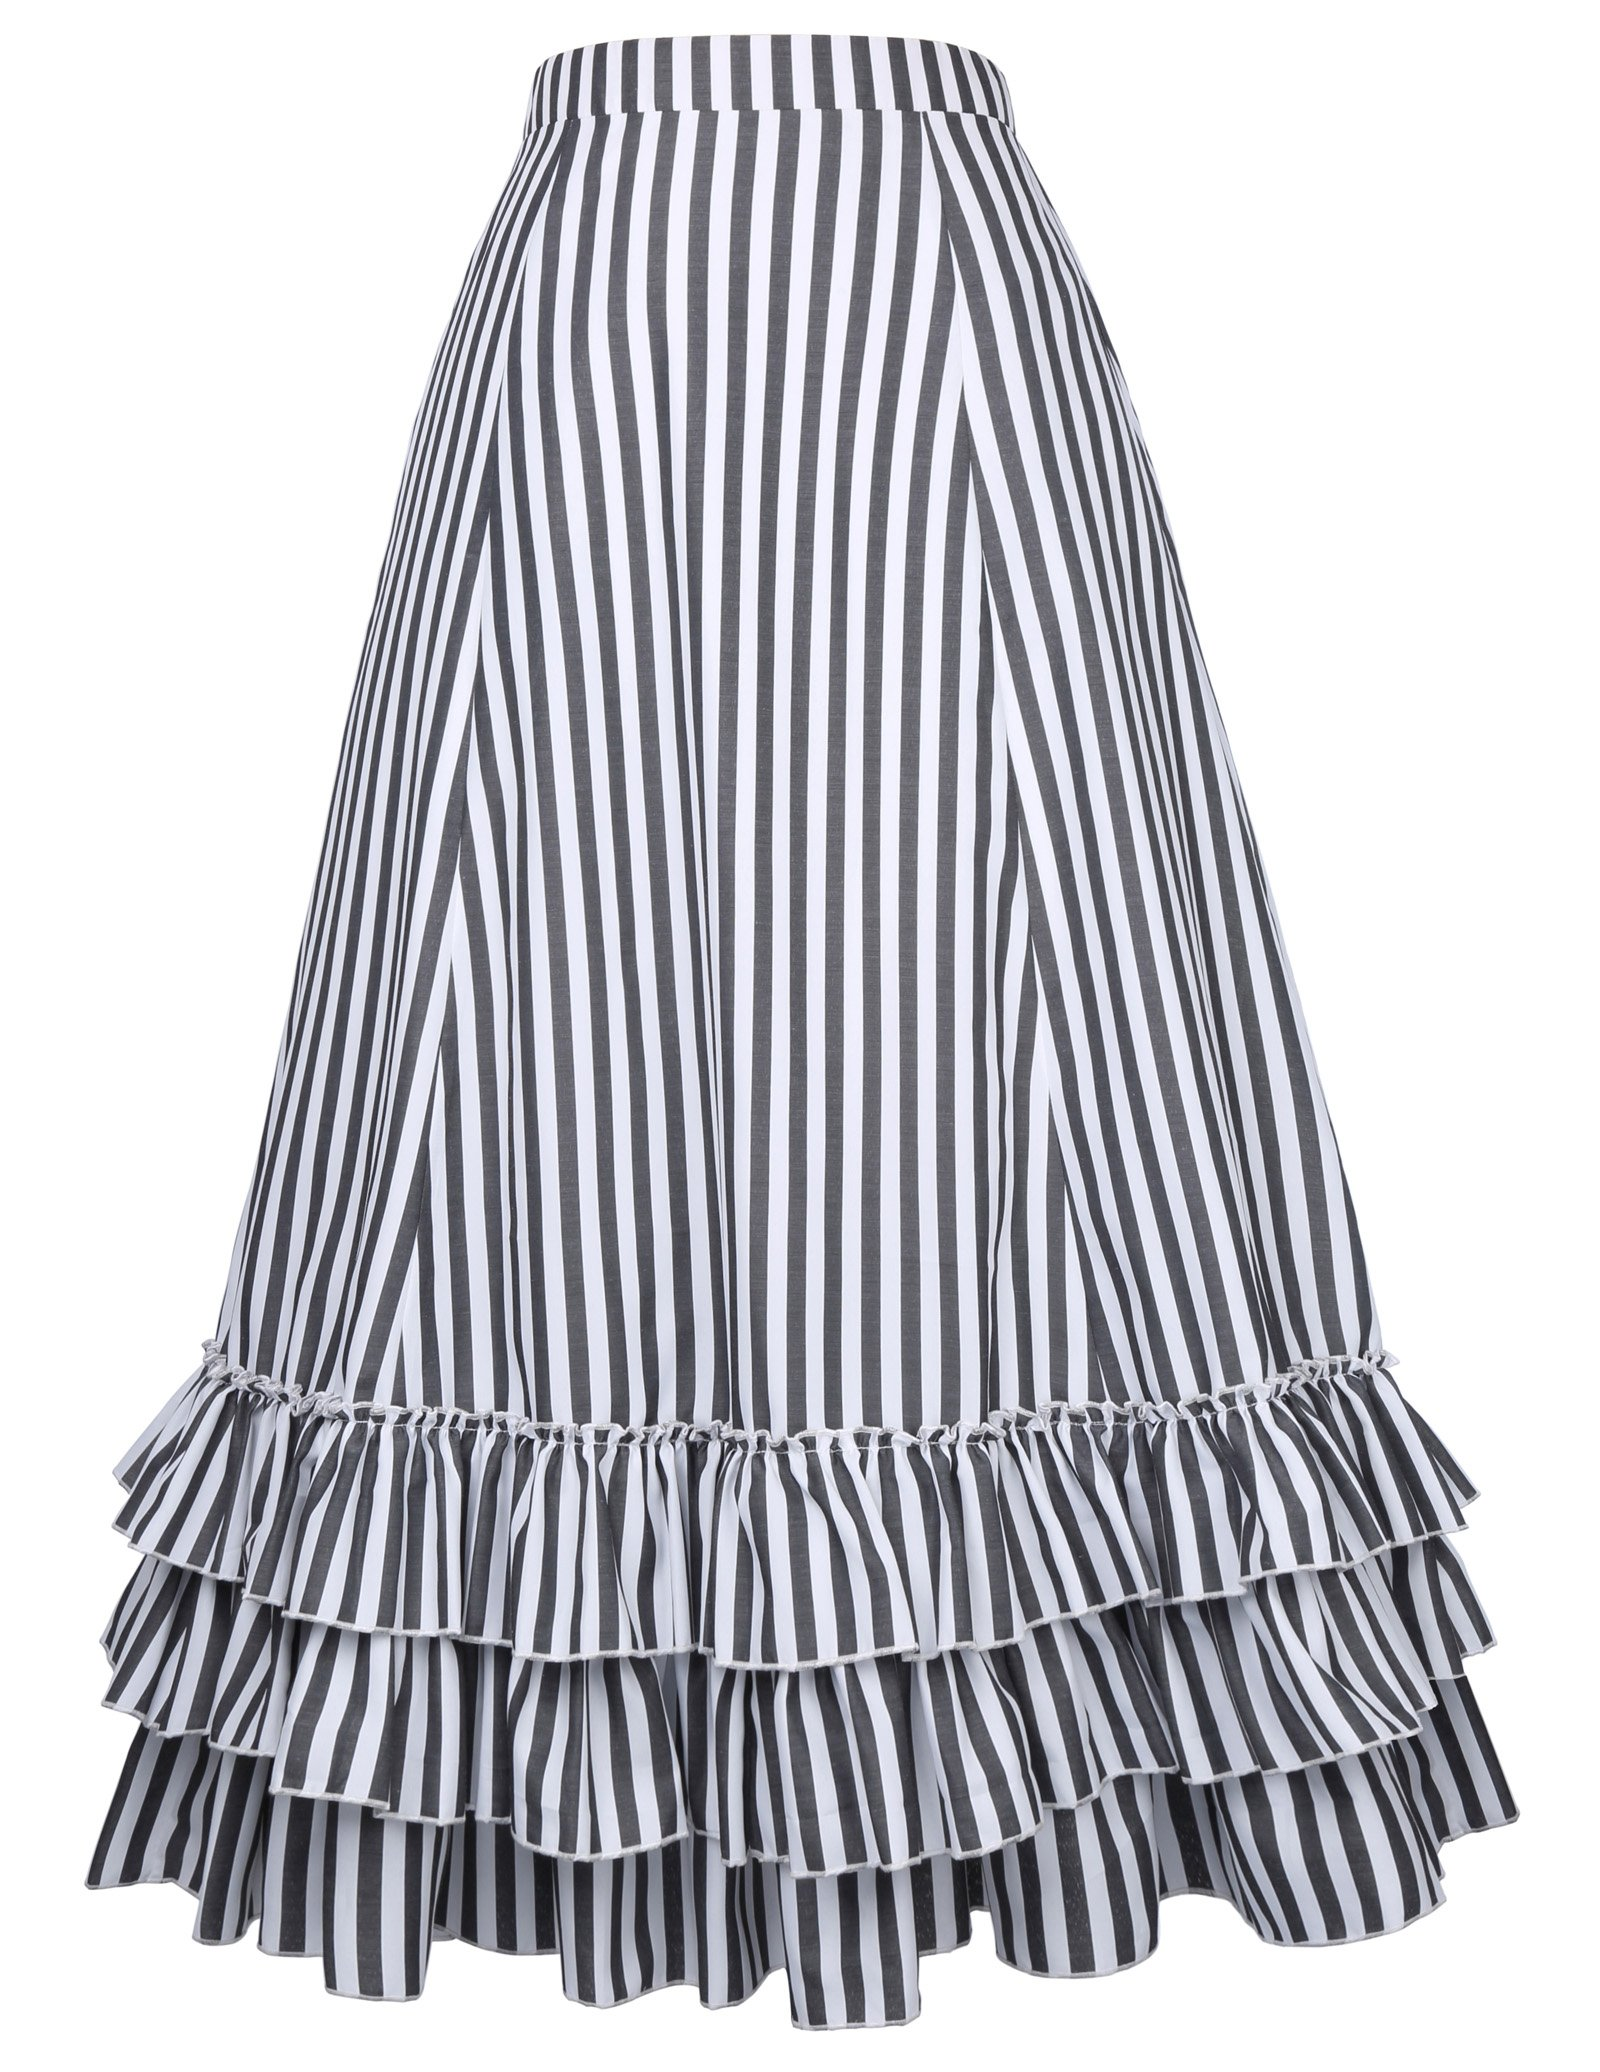 Belle Poque Women's Vintage Stripes Gothic Victorian Skirt Renaissance Style Falda 4